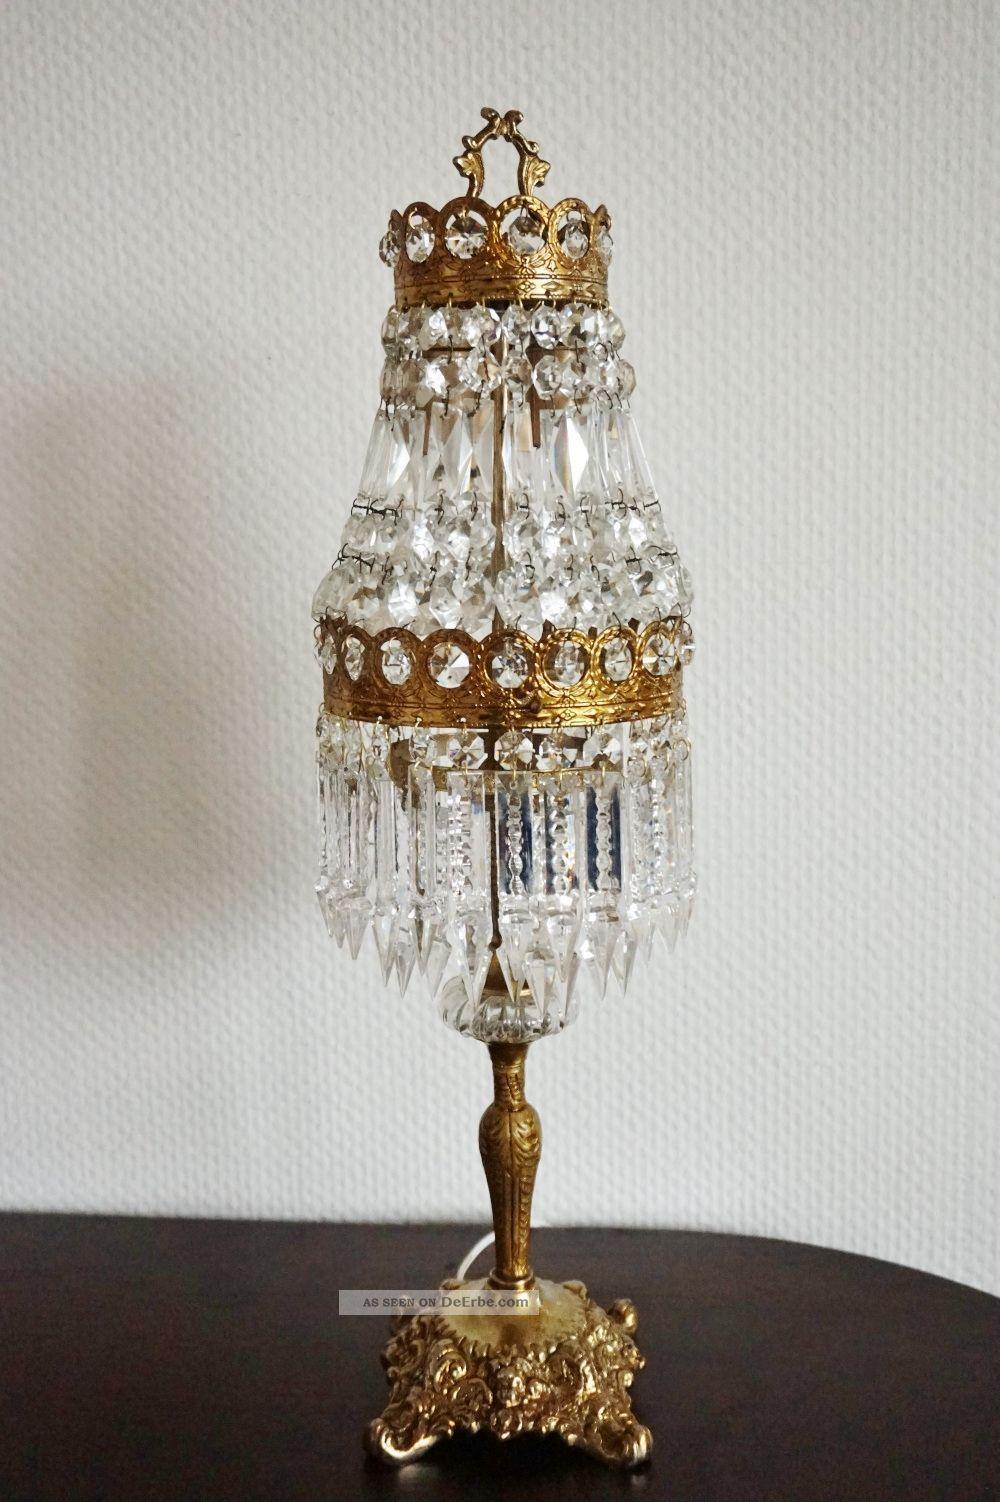 Full Size of Kristall Stehlampe Mobiliar Interieur Lampen Leuchten Antike Originale Vor Wohnzimmer Schlafzimmer Stehlampen Wohnzimmer Kristall Stehlampe